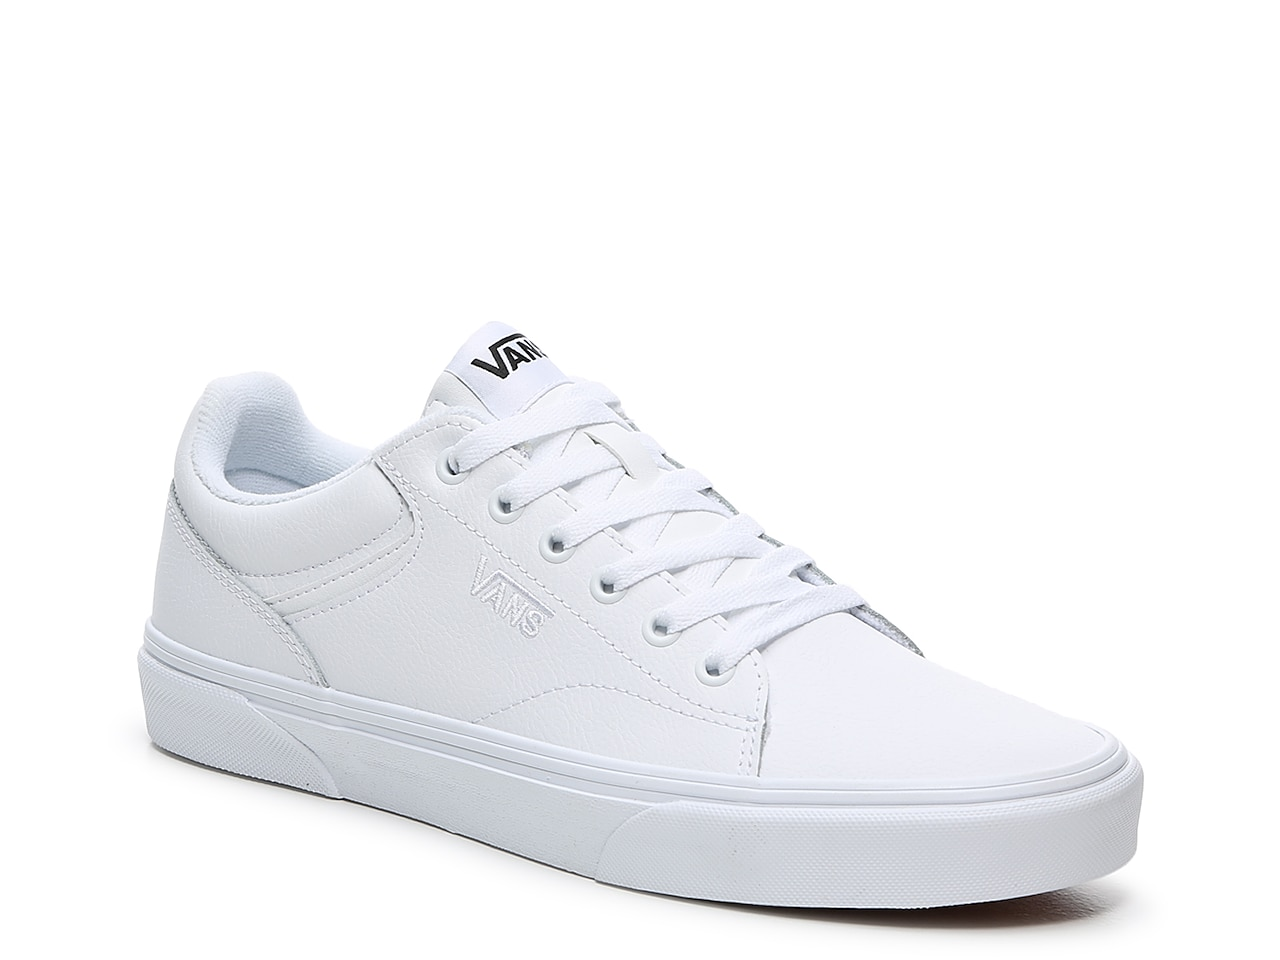 Seldan Sneaker - Men's